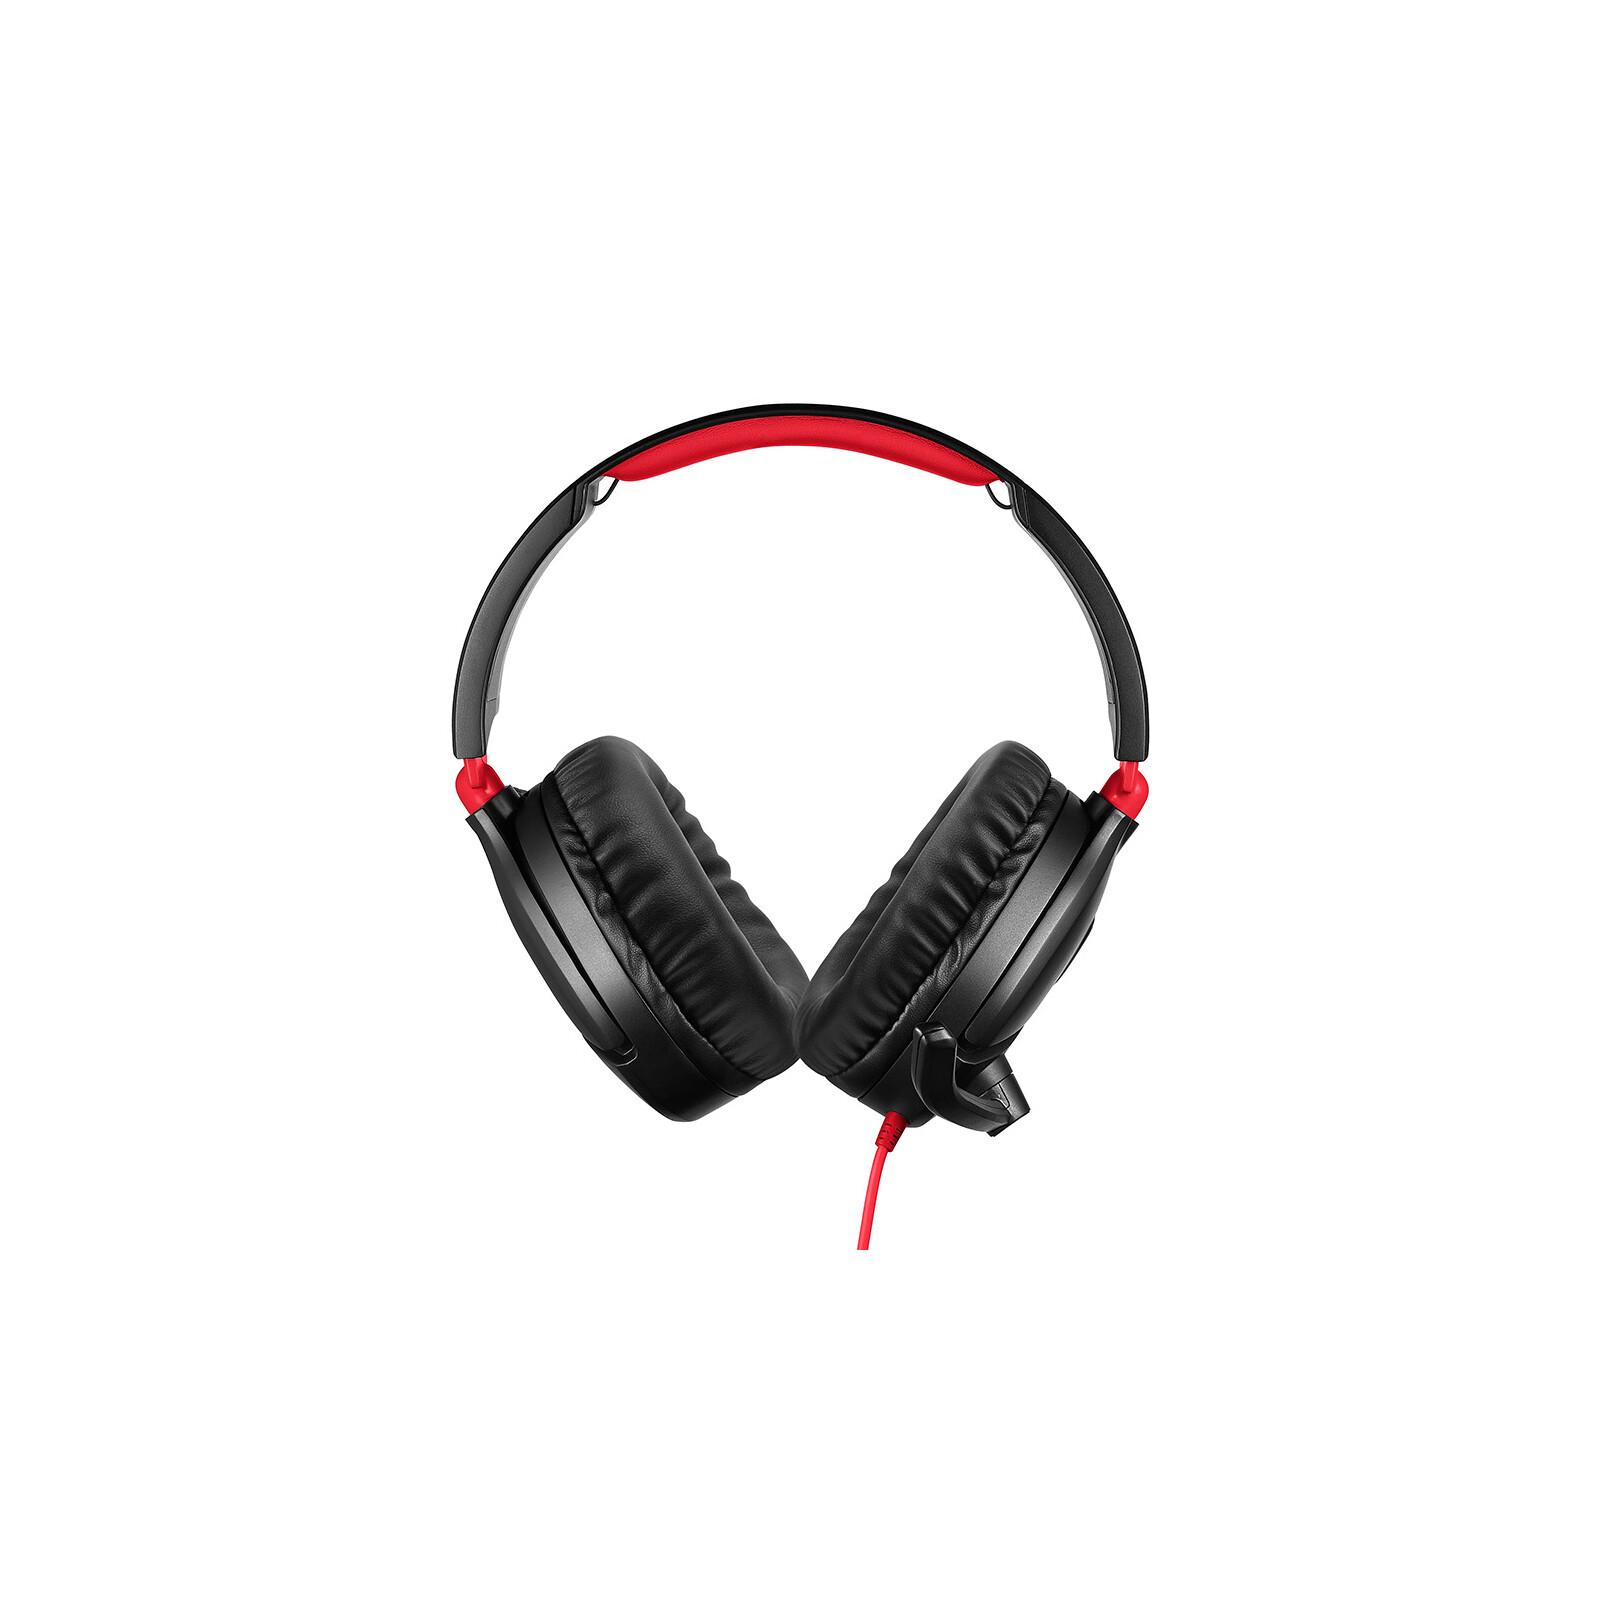 Turtle Beach Ear Force Recon 70N black Gaming Headset